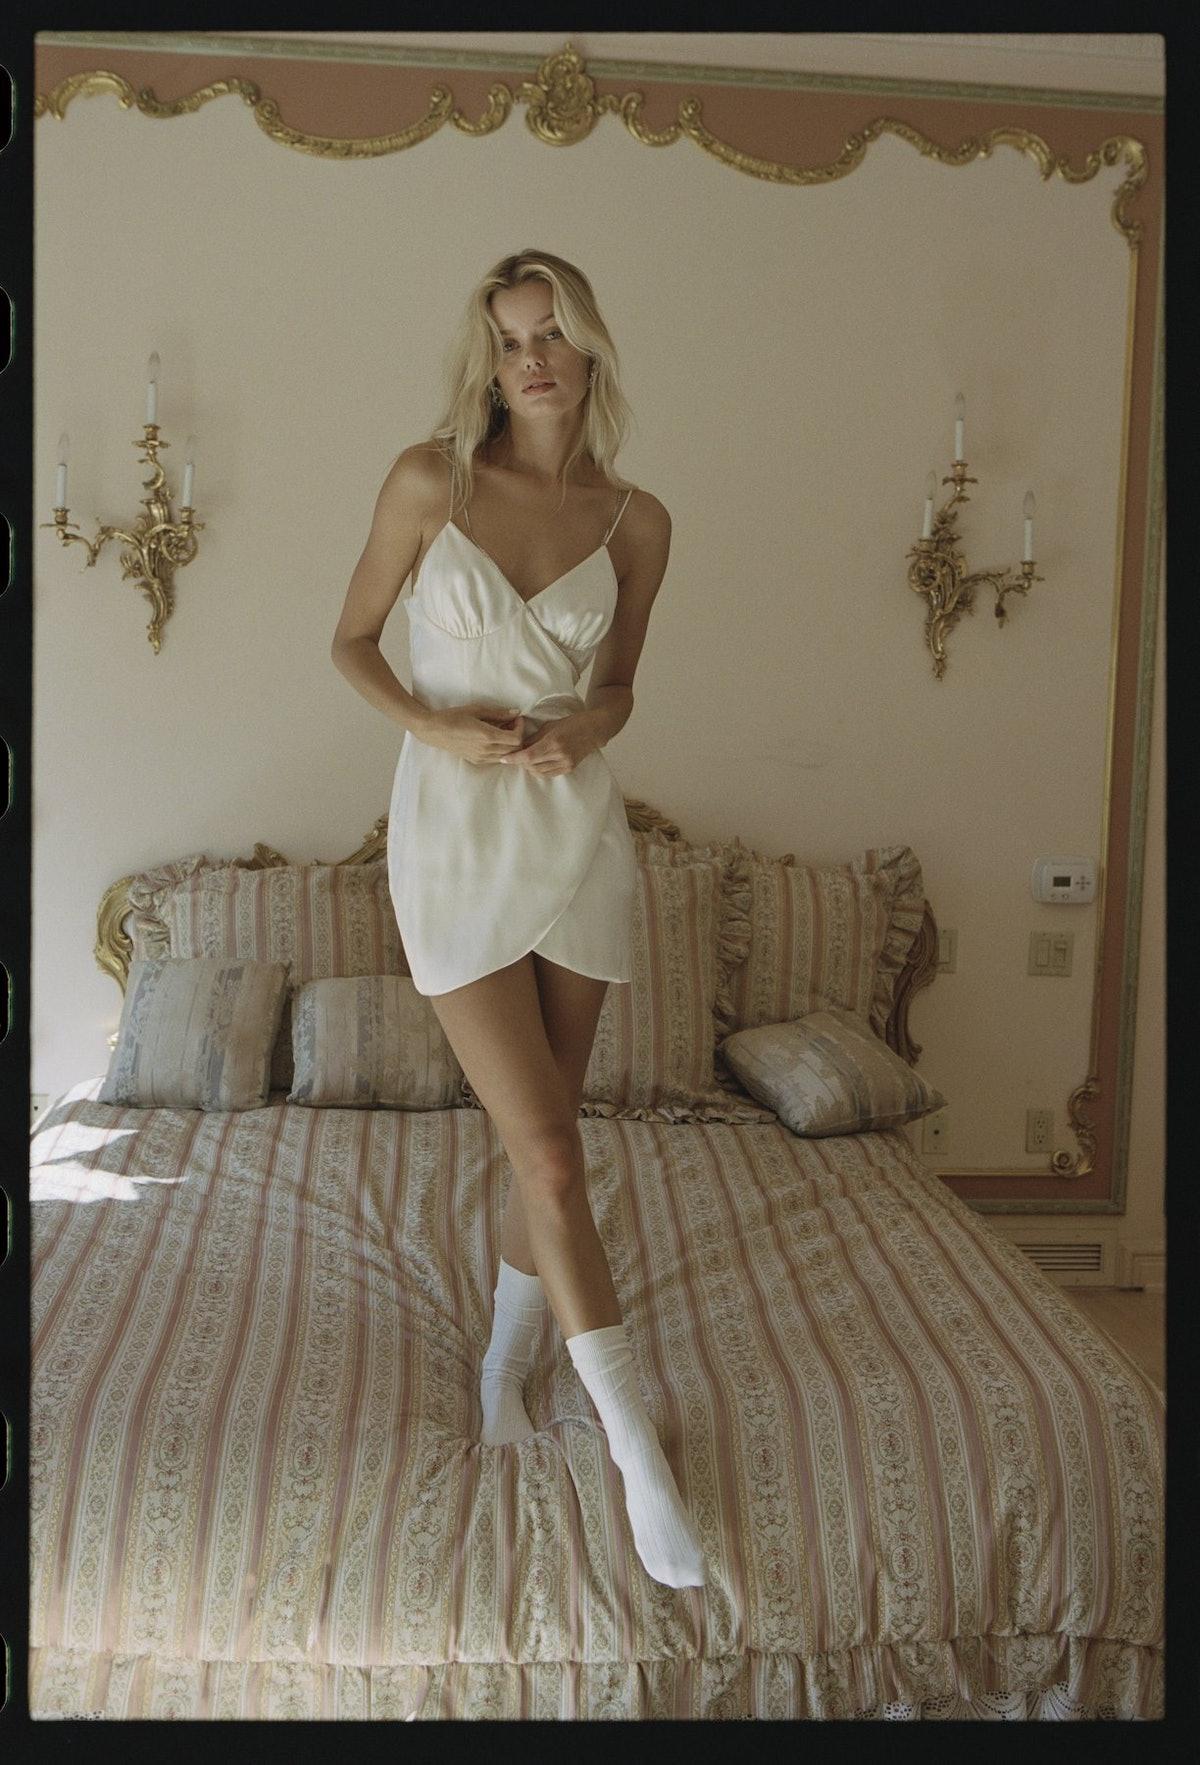 White Farah dress from Nana Jacqueline.